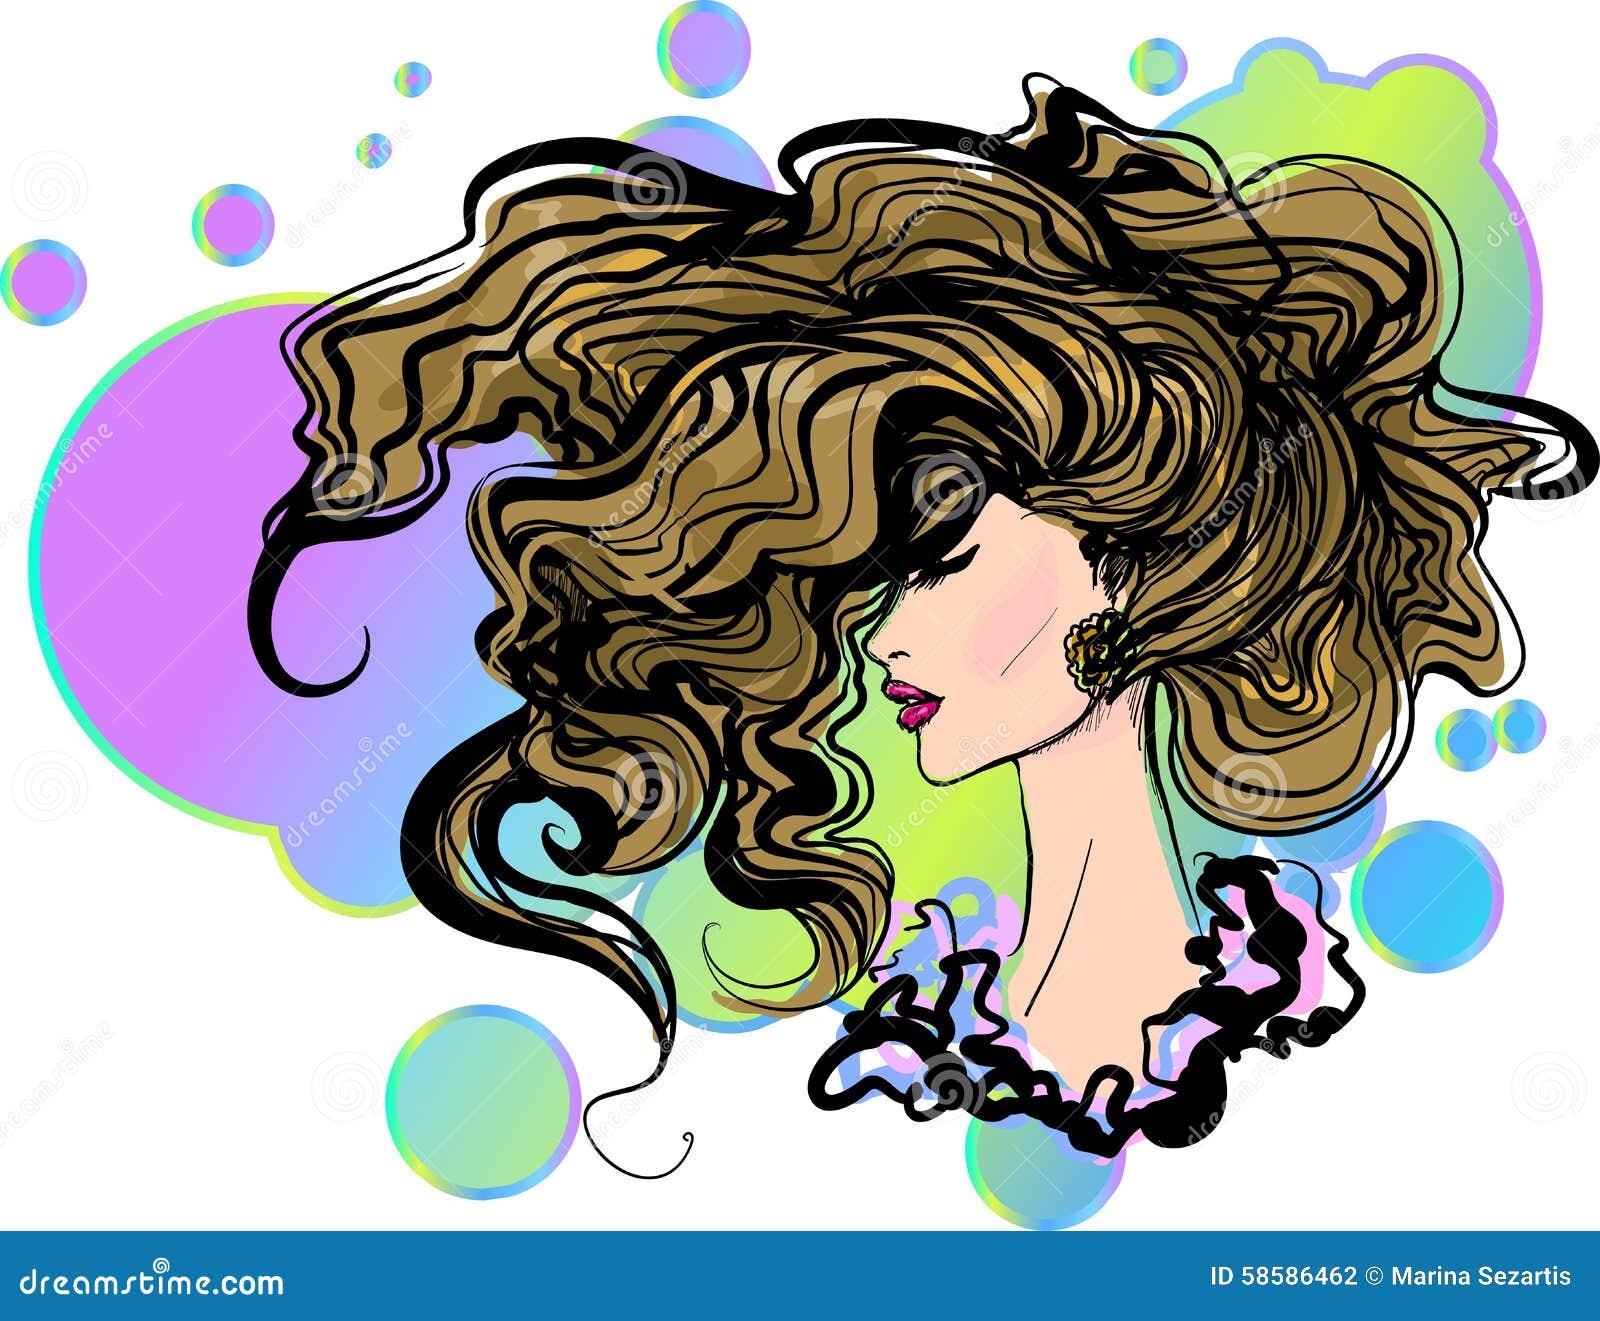 cd20877d466b19 Vector Stylish Hand-drawn Graphic Girl Portrait Stock Vector ...